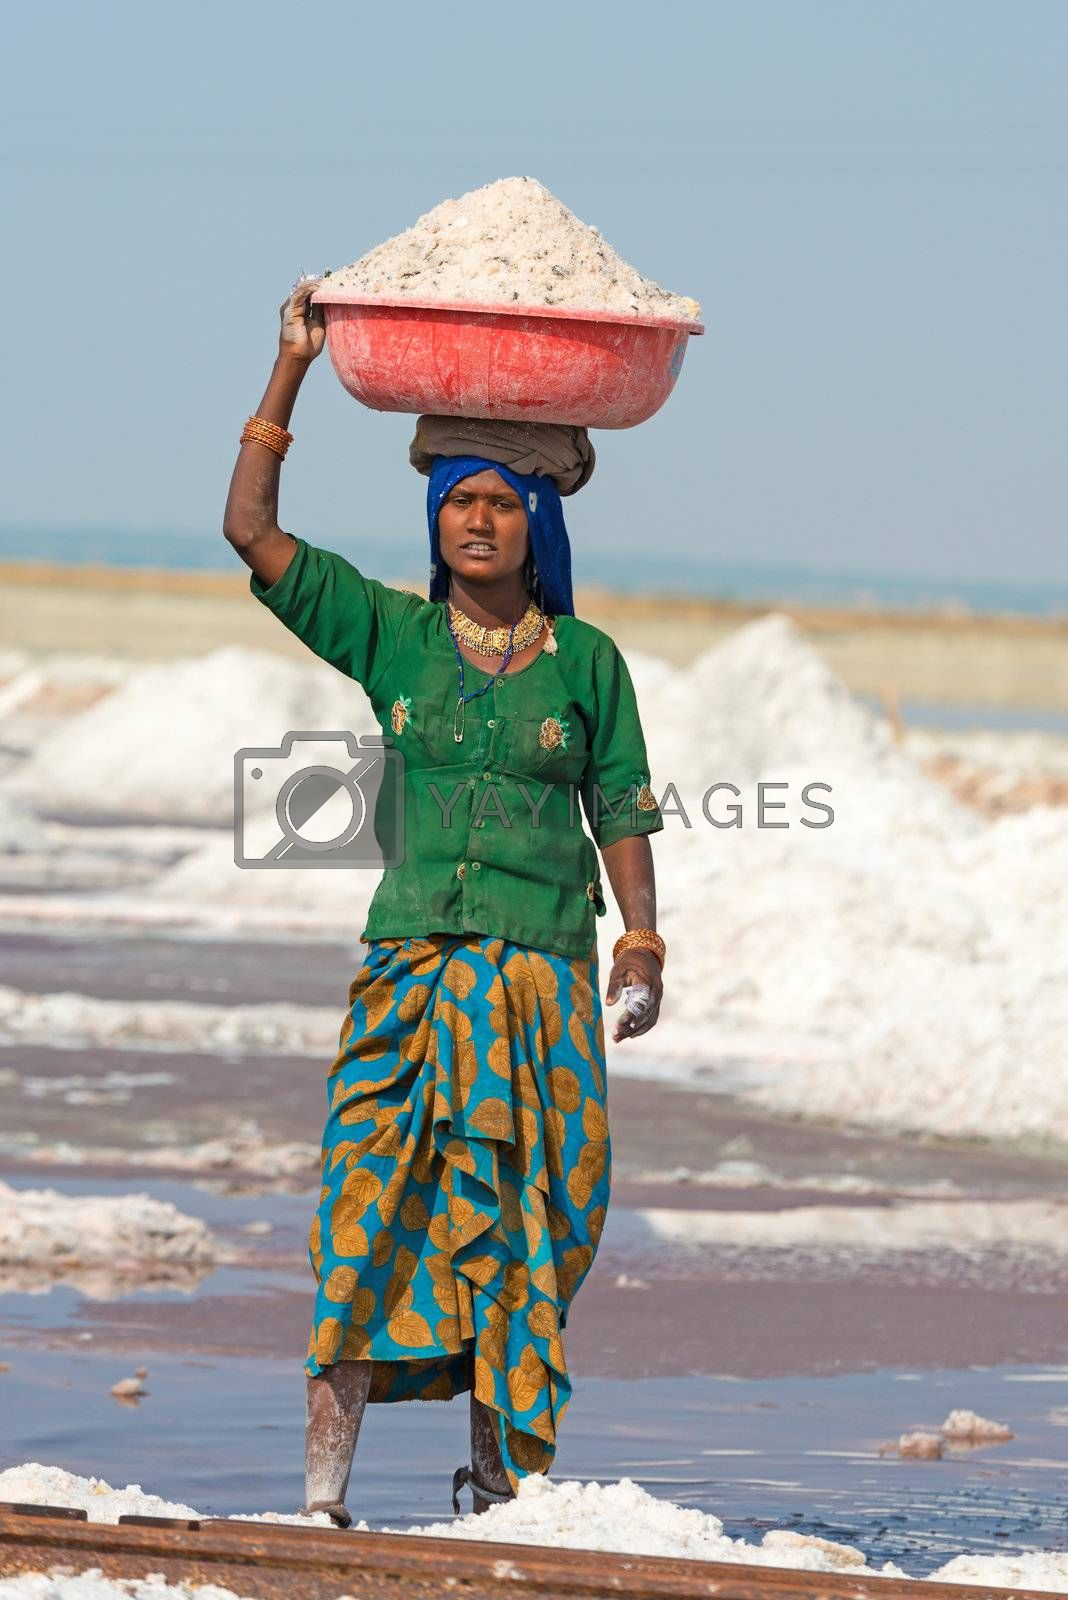 Sambhar, India - Nov 19: Woman carries bowl on head with salt in salt farm on Nov 19, 2012 in Sambhar Salt Lake, India. It is India's largest saline lake and where salt has been farmed for a thousand years.